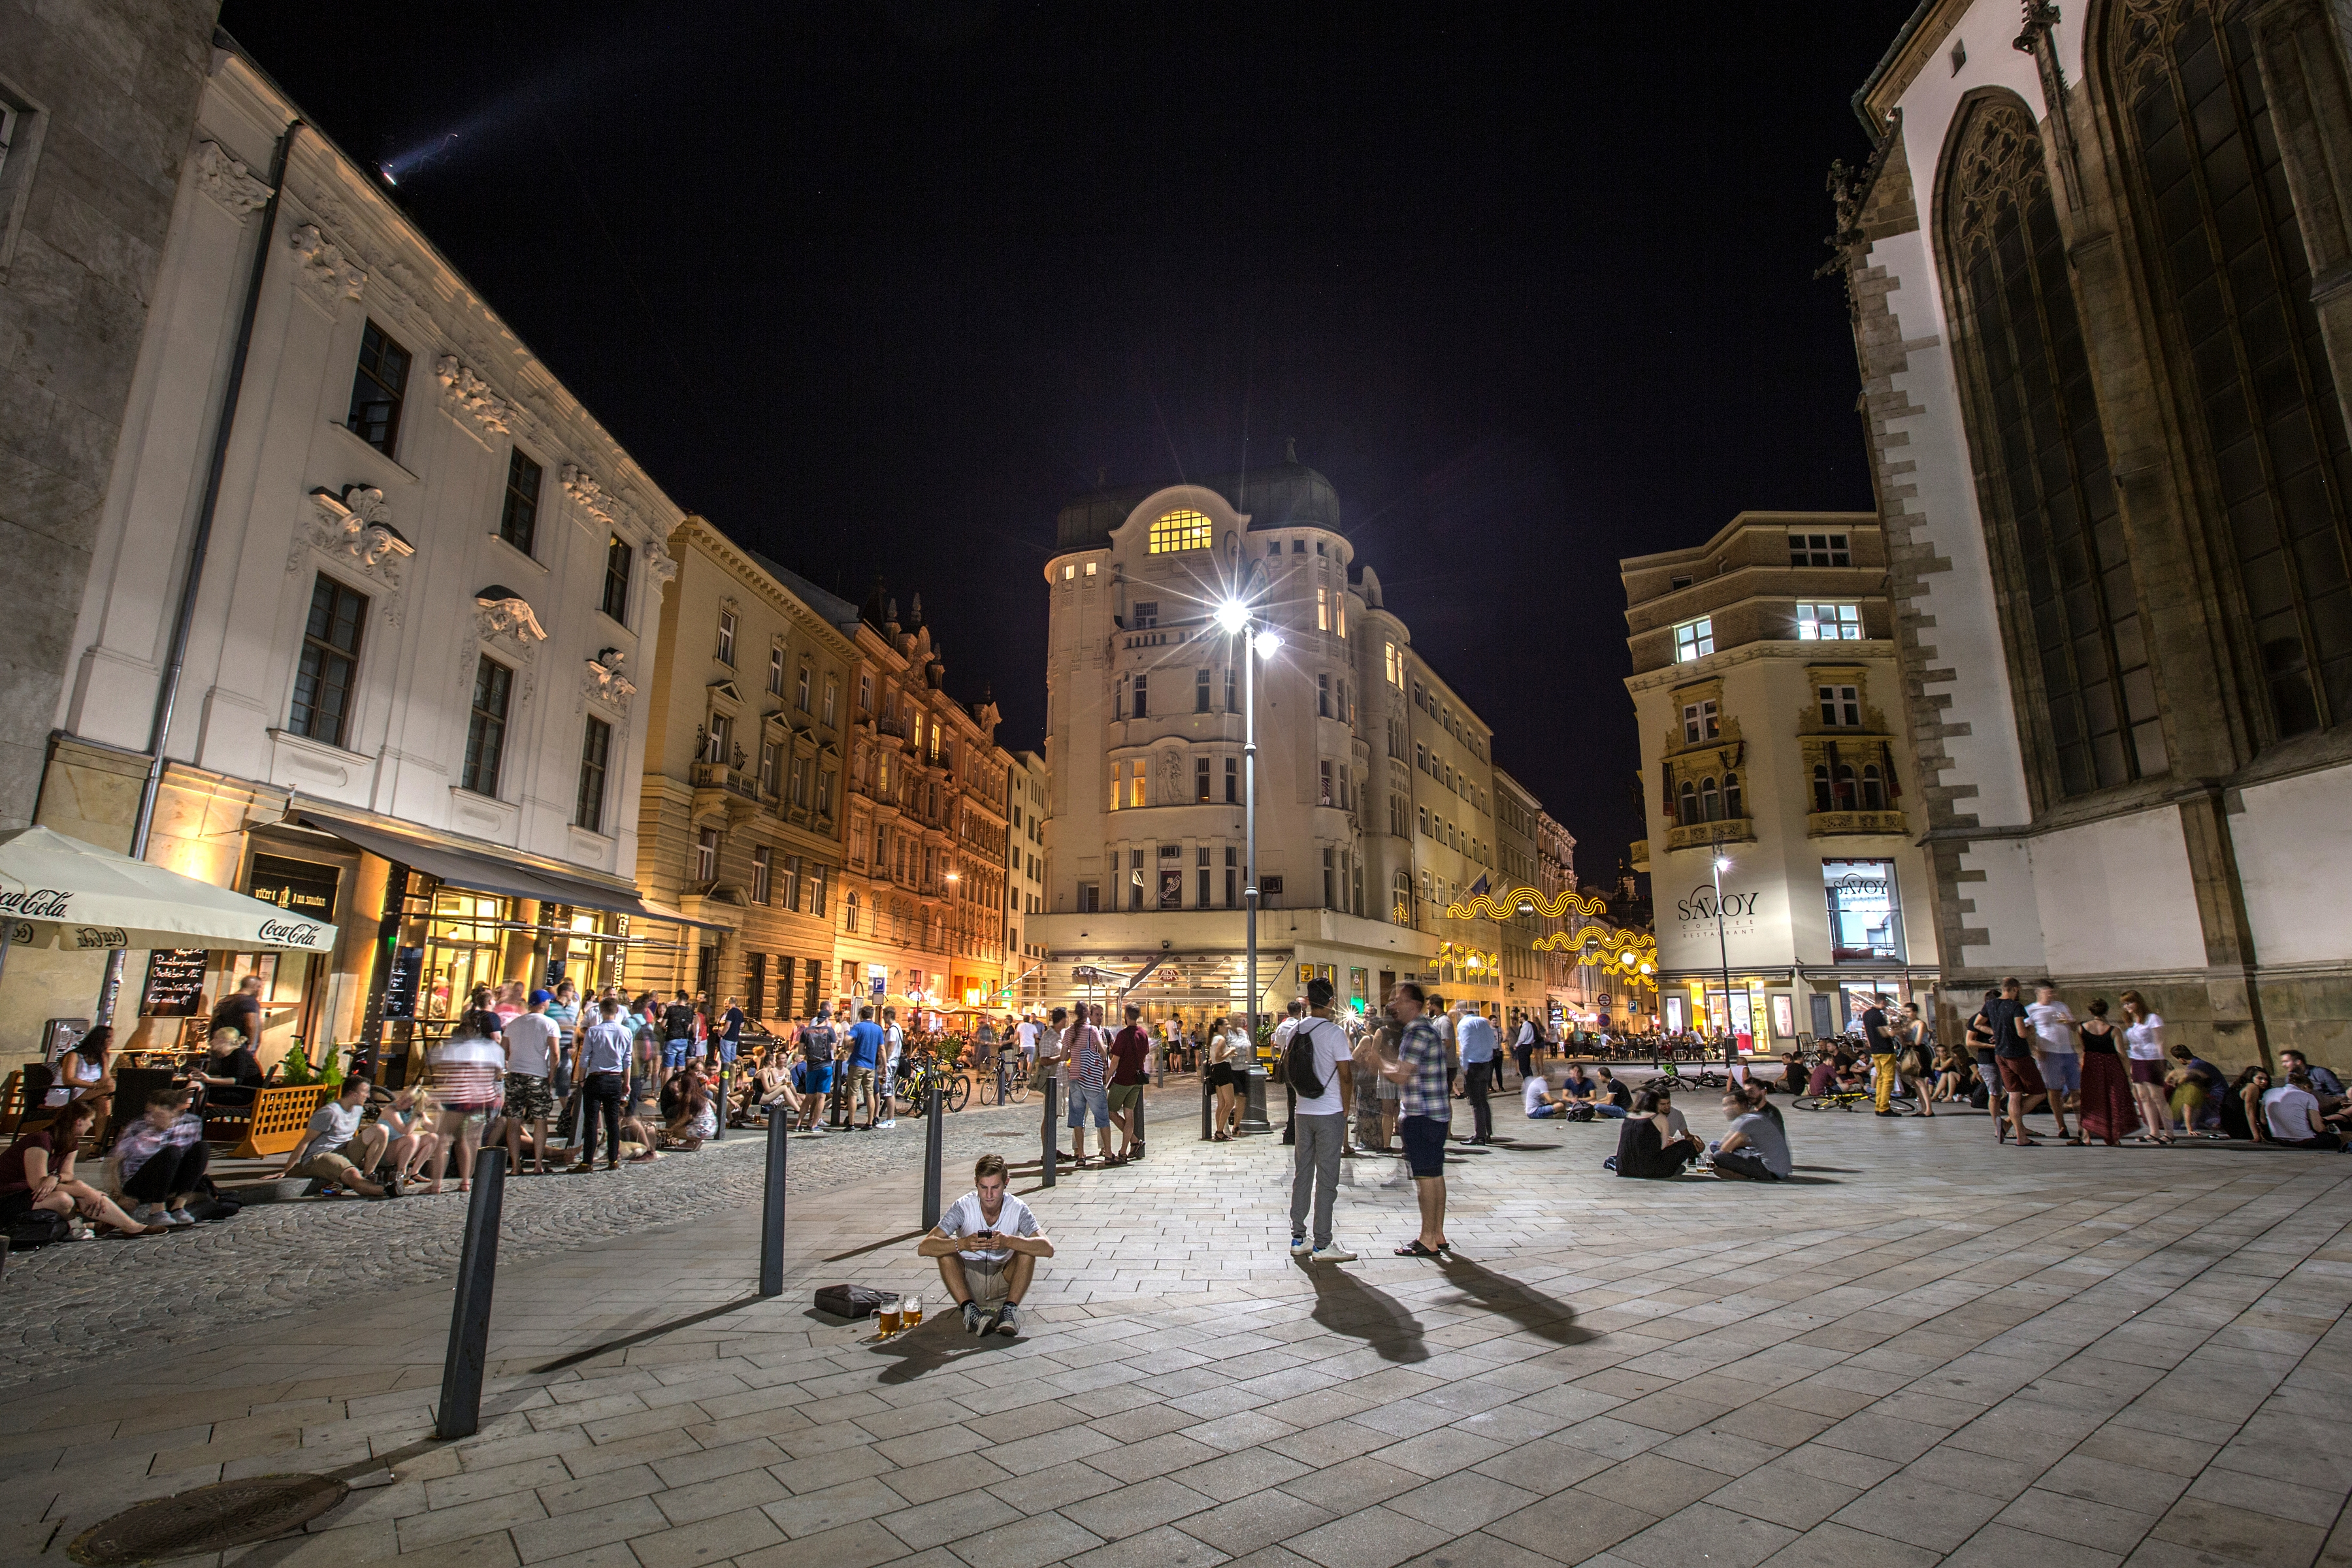 St James' Square in Brno. Night live.